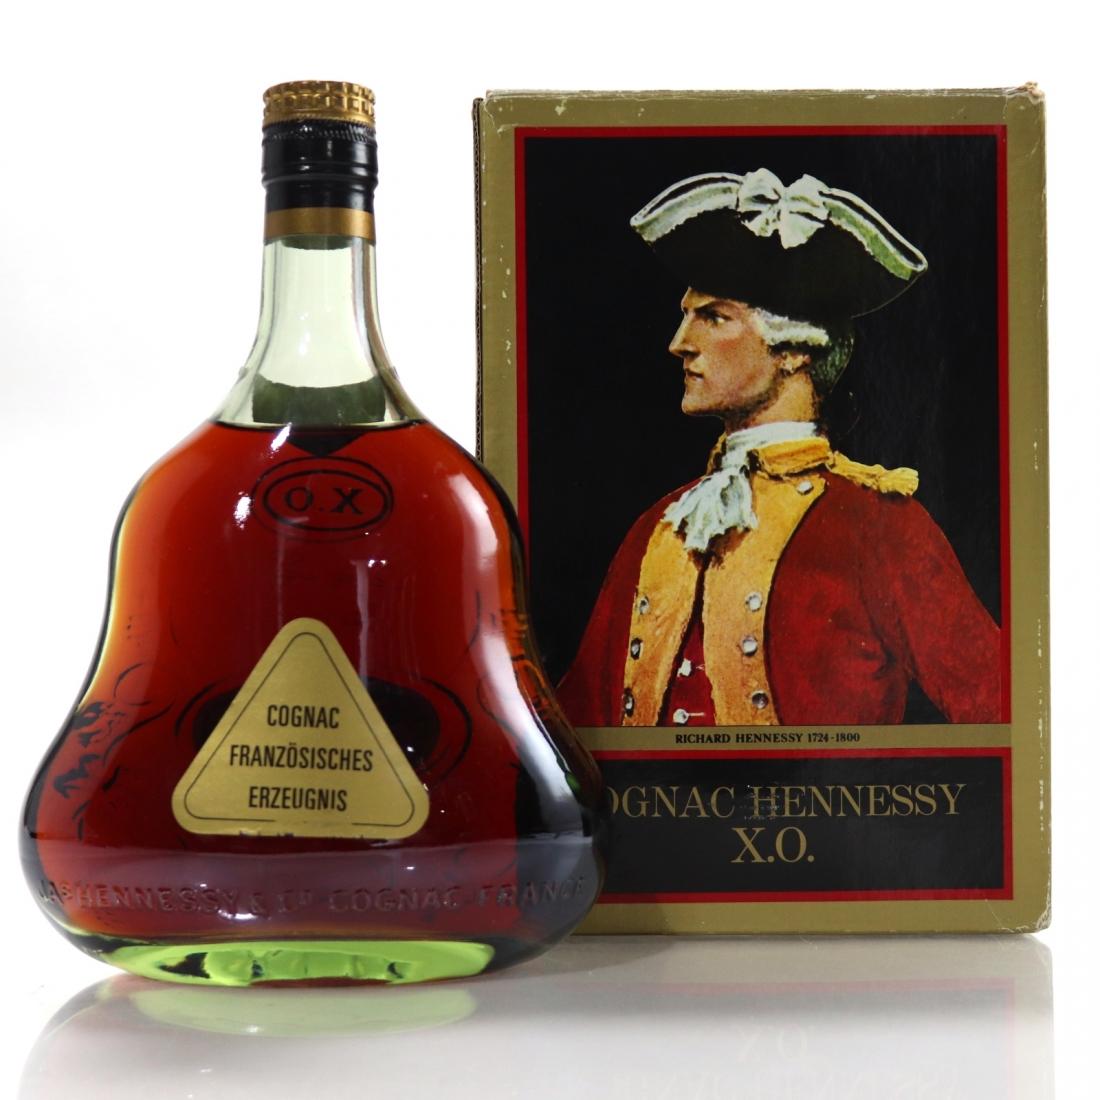 Hennessy XO Cognac 1970s / German Import